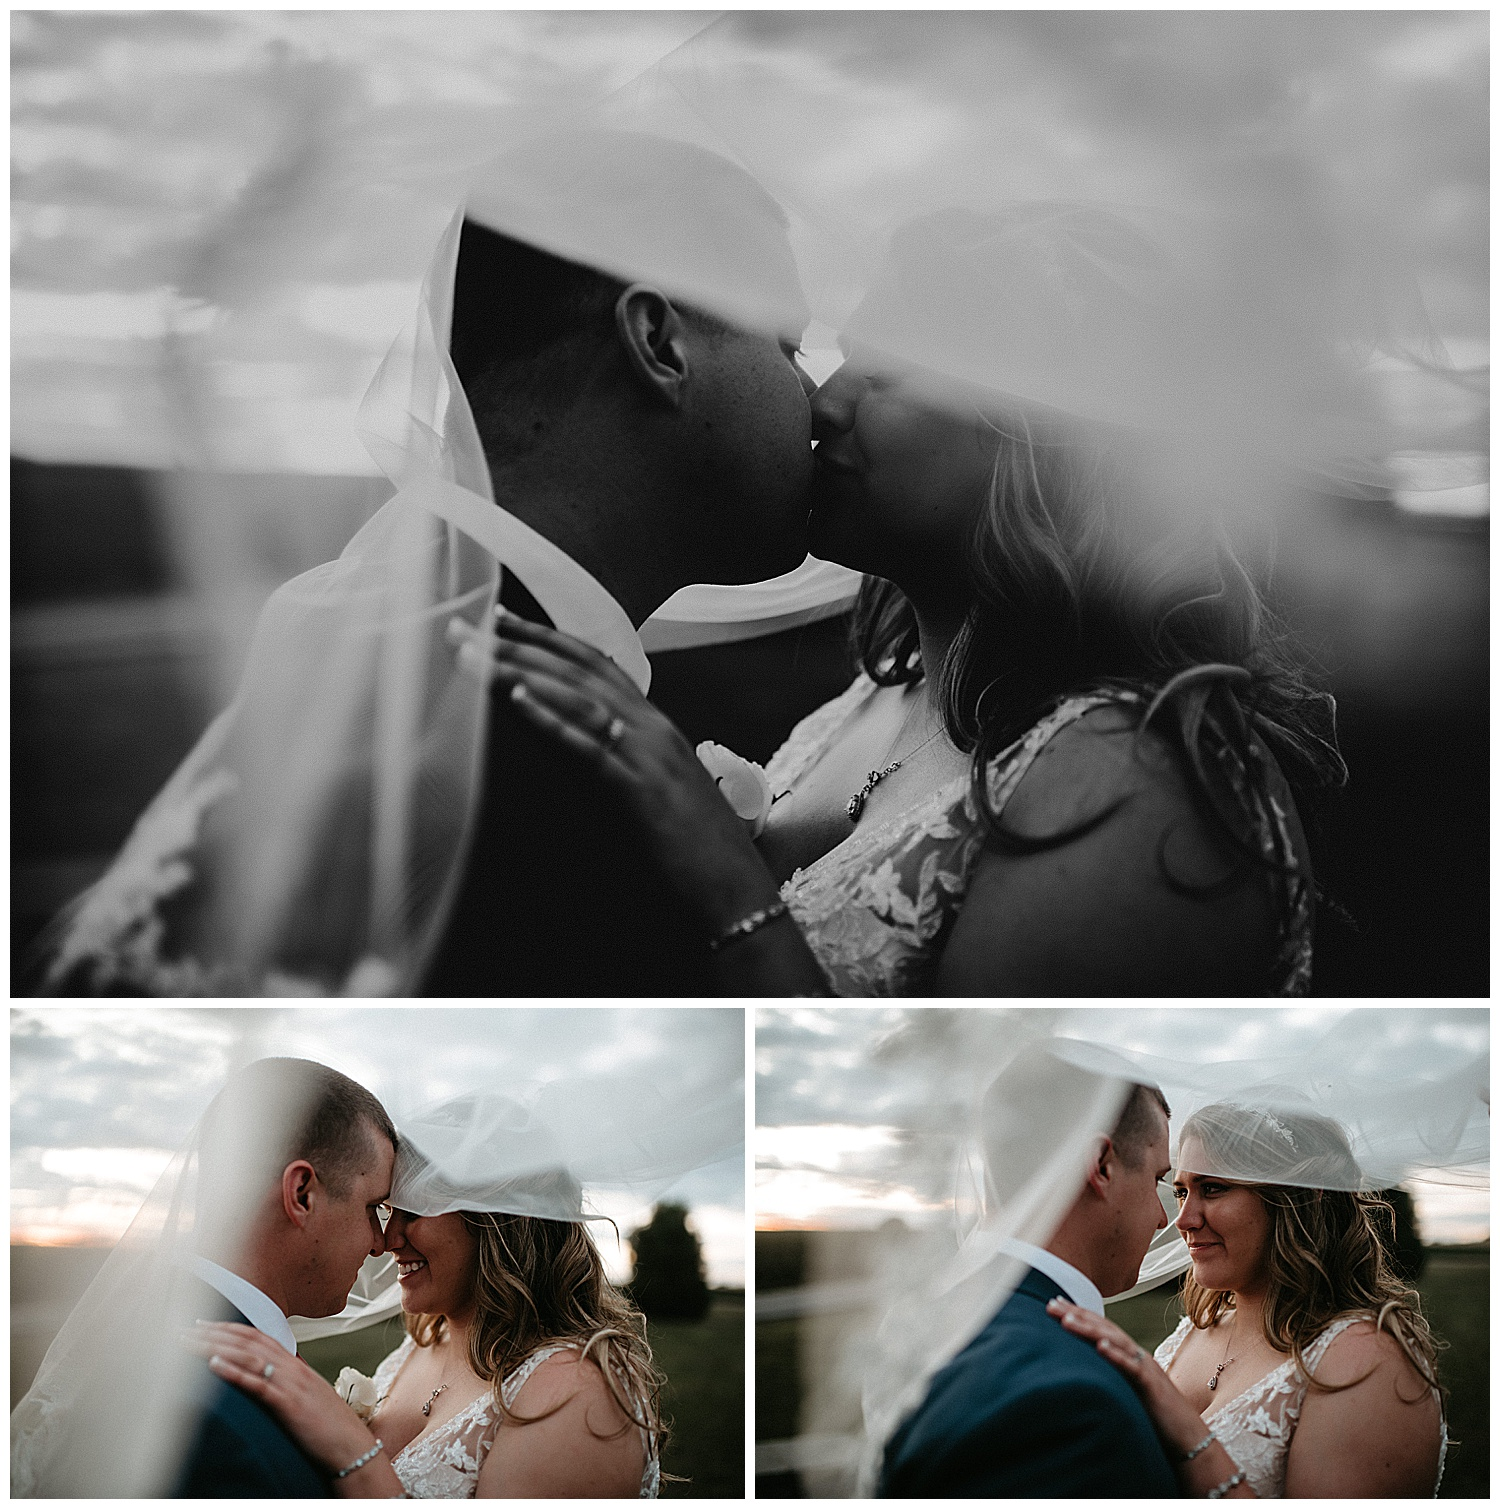 NEPA-Bloomgsburg-Wedding-Photographer-at-The-Barn-at-Greystone-Farms-Watsontown-PA_0105.jpg